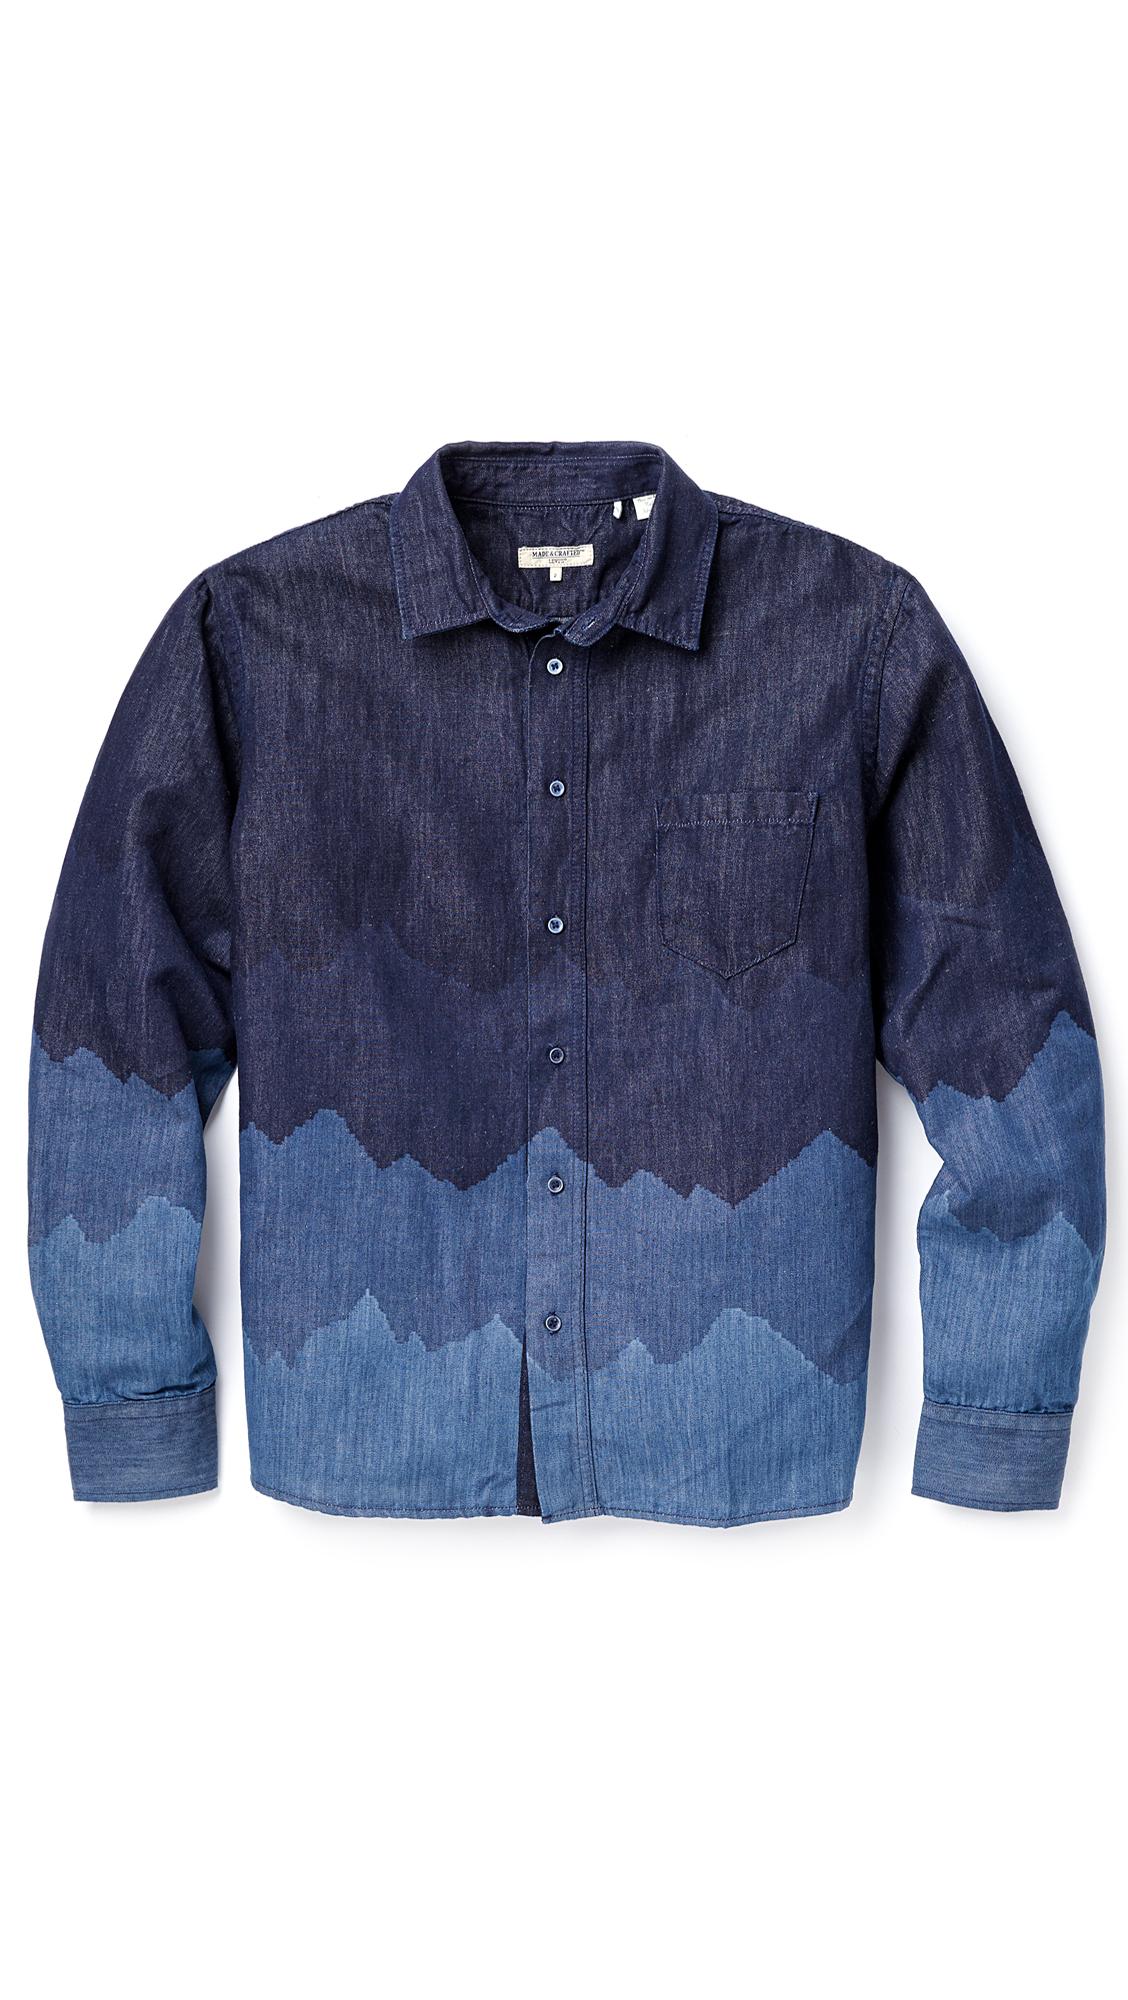 levi 39 s denim mountains classic shirt in blue for men. Black Bedroom Furniture Sets. Home Design Ideas